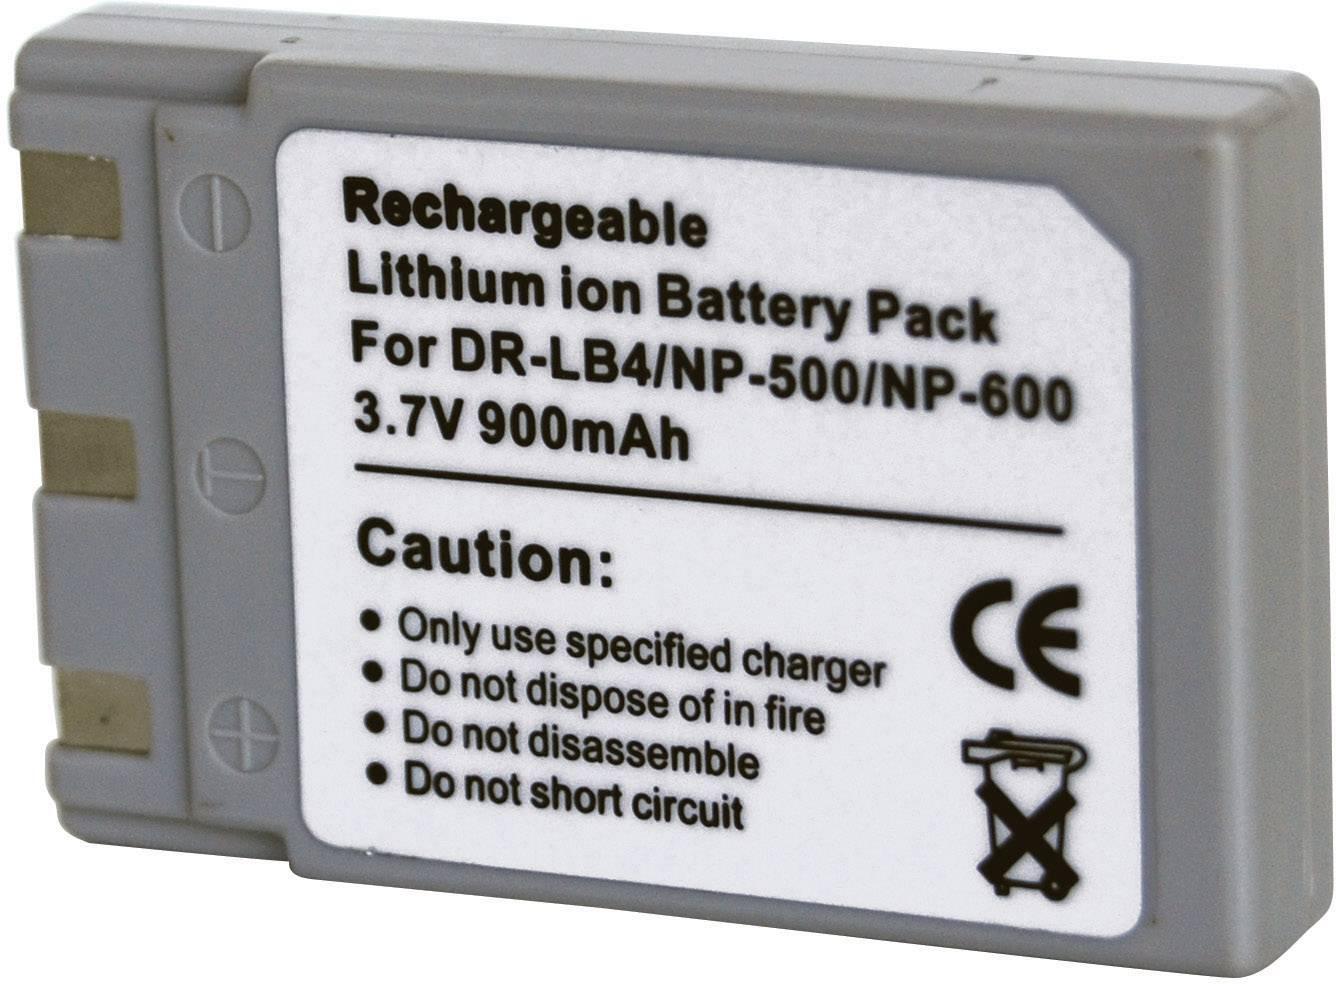 Hama liion Battery Pack 3,7 v//850 mAh para konica minolta dr-lb4